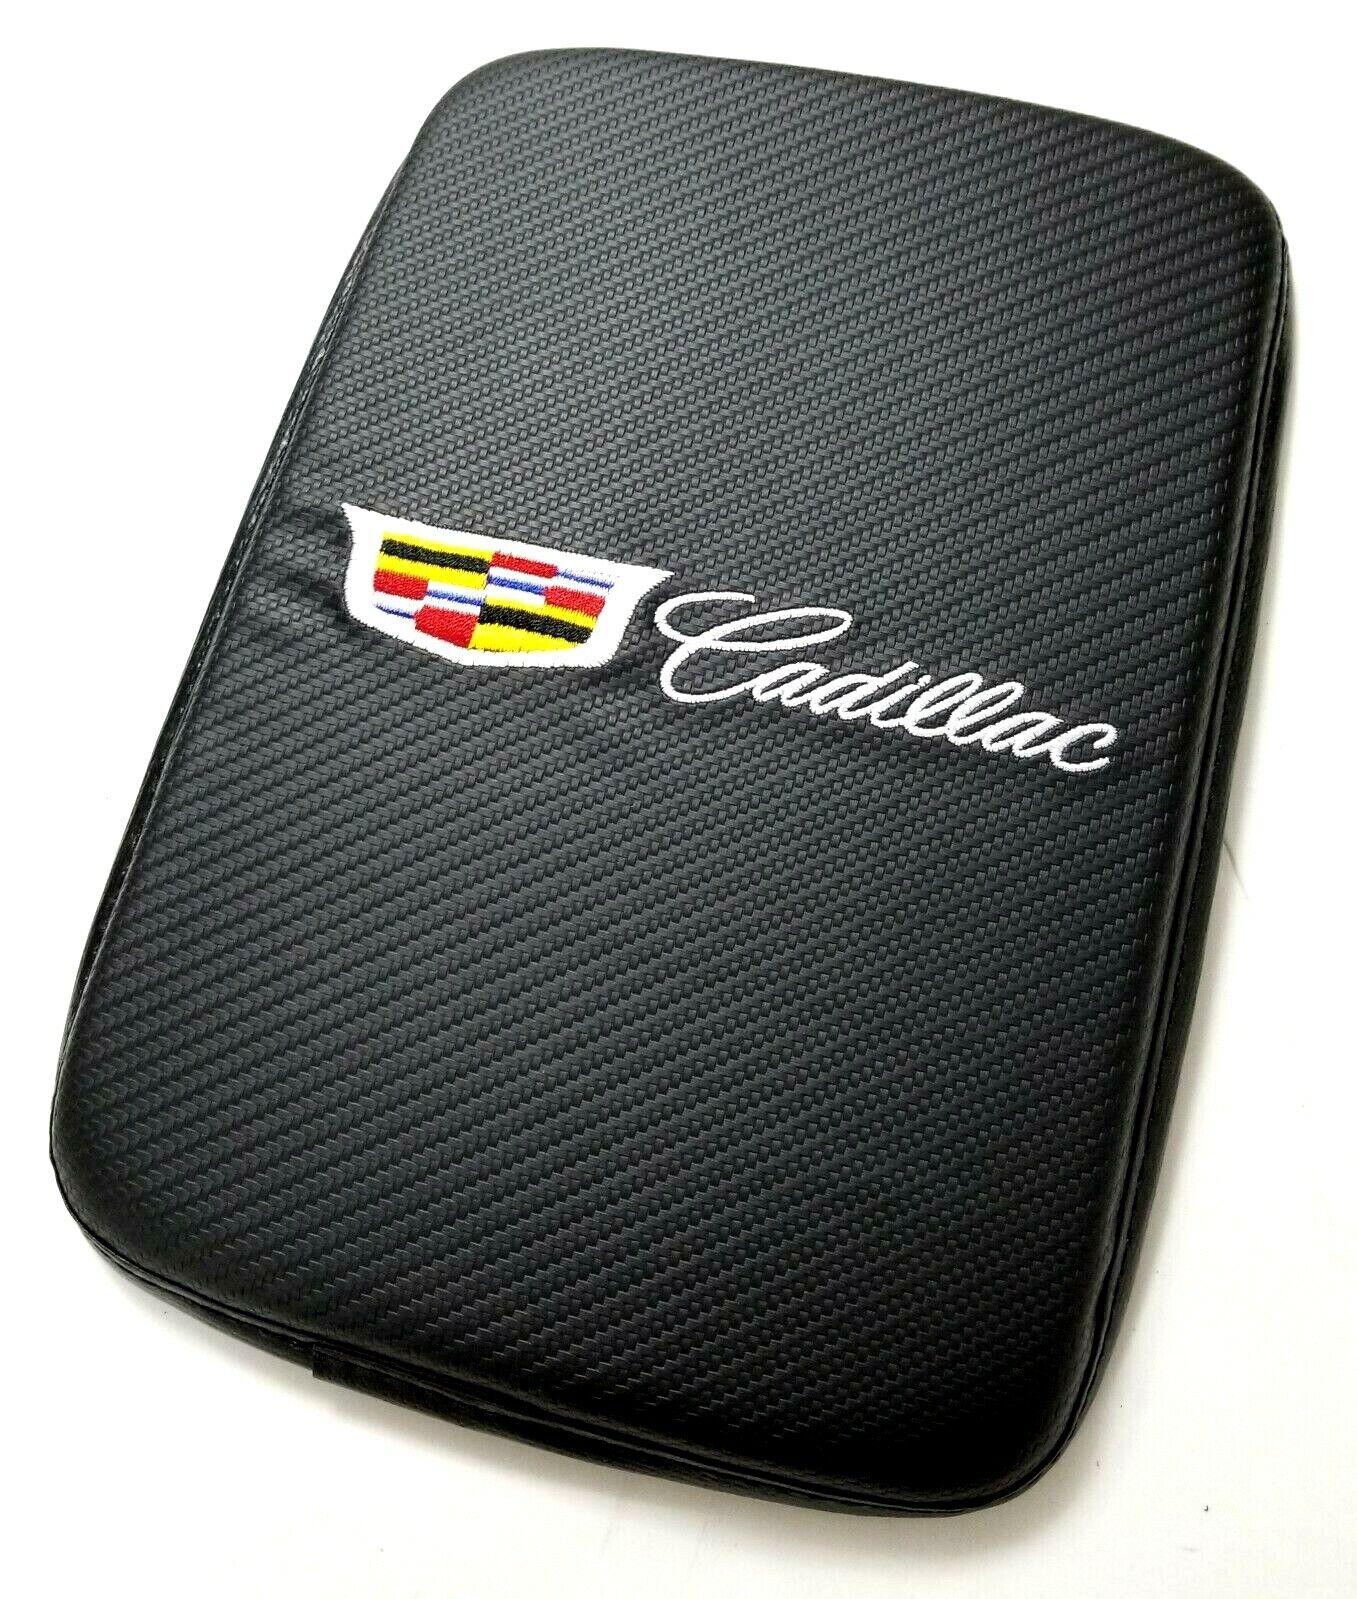 Car Parts - BRAND NEW CADILLAC Carbon Fiber Car Center Console Armrest Cushion Pad Cover